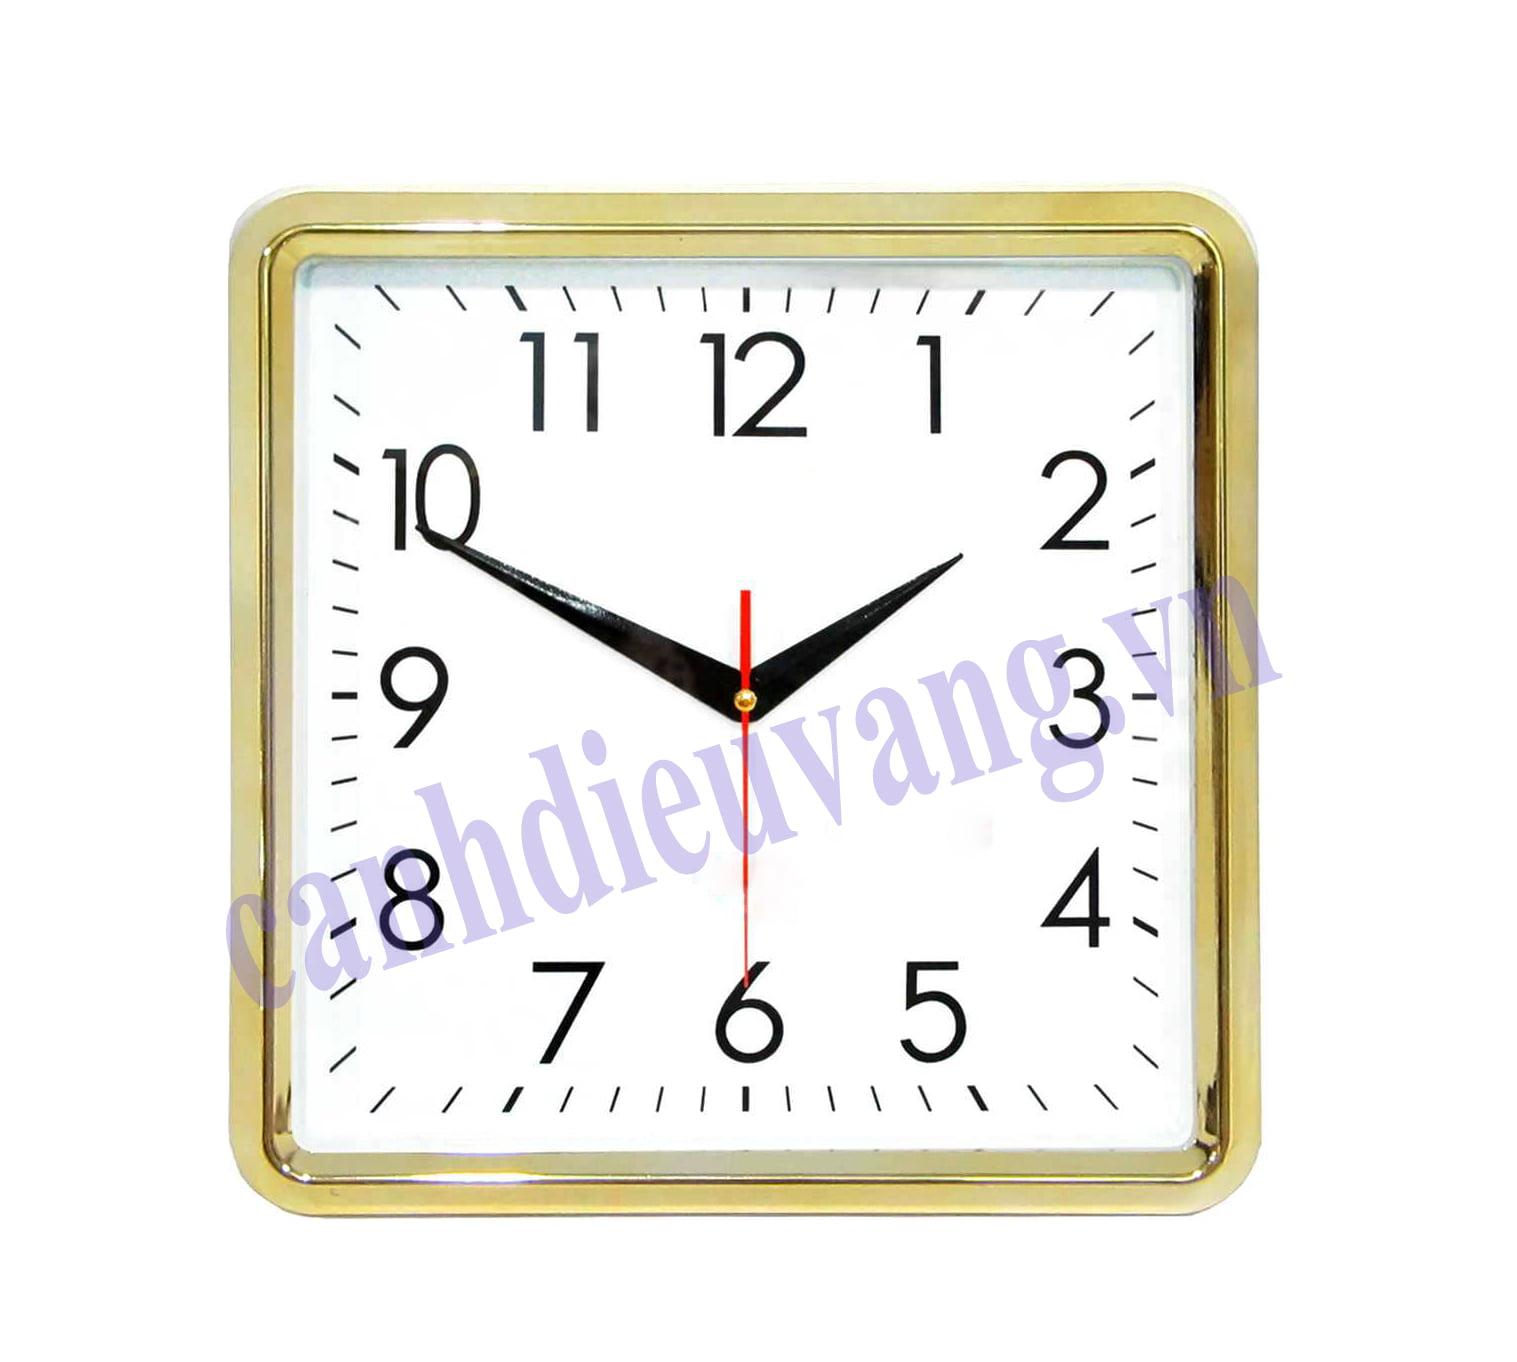 Đồng hồ treo tường B440